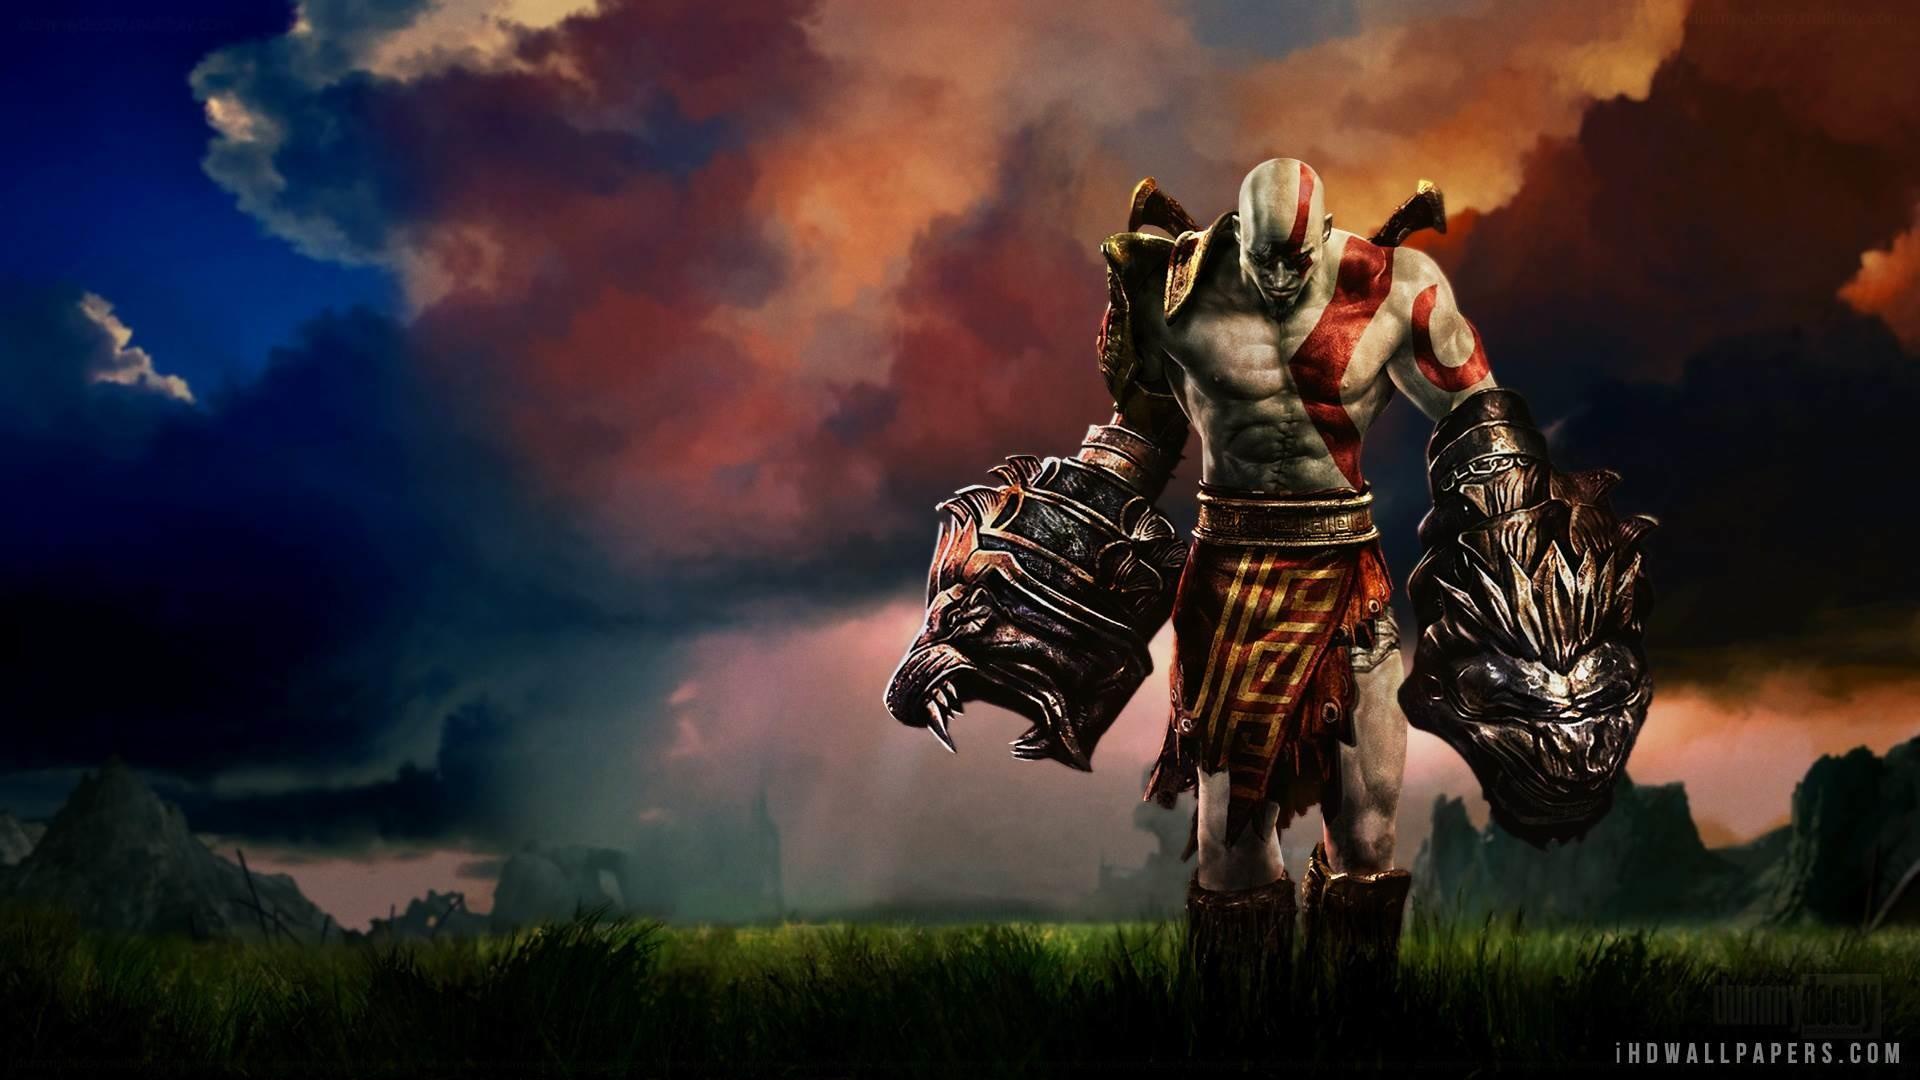 Pubg 1440p Wallpaper Kratos Hd Wallpaper 183 ① Wallpapertag